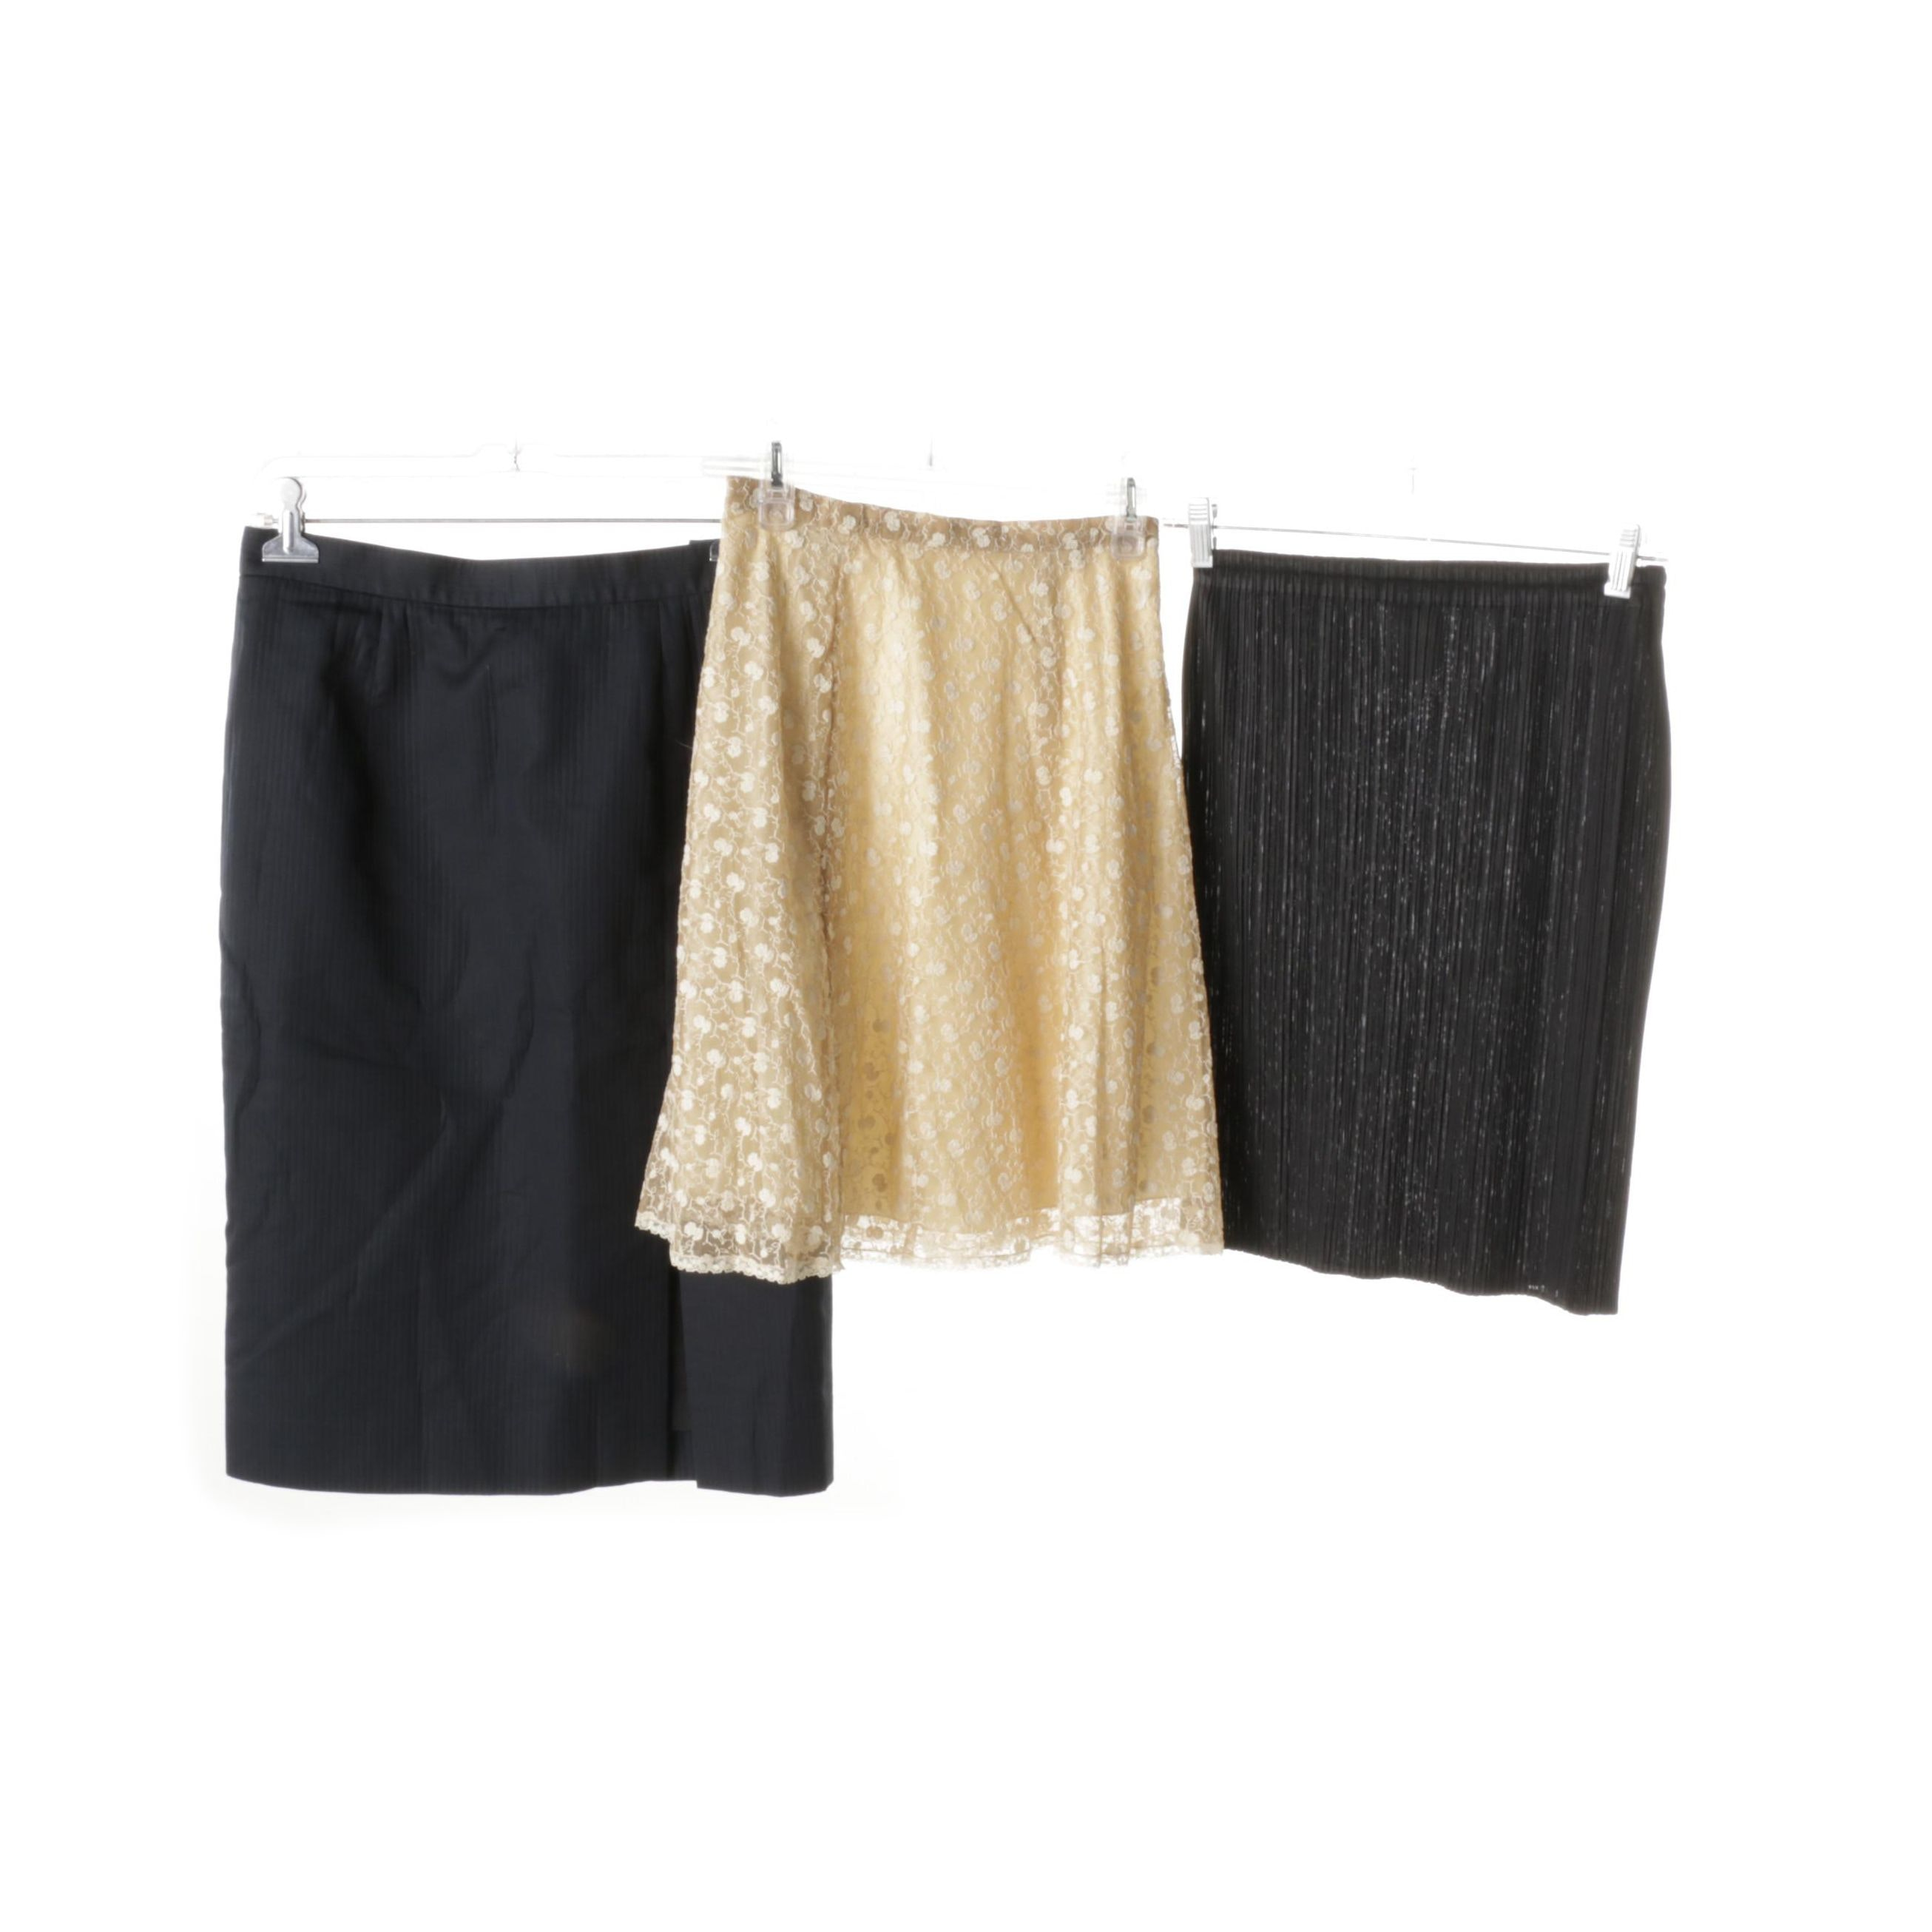 Women's Skirts Including Carlisle